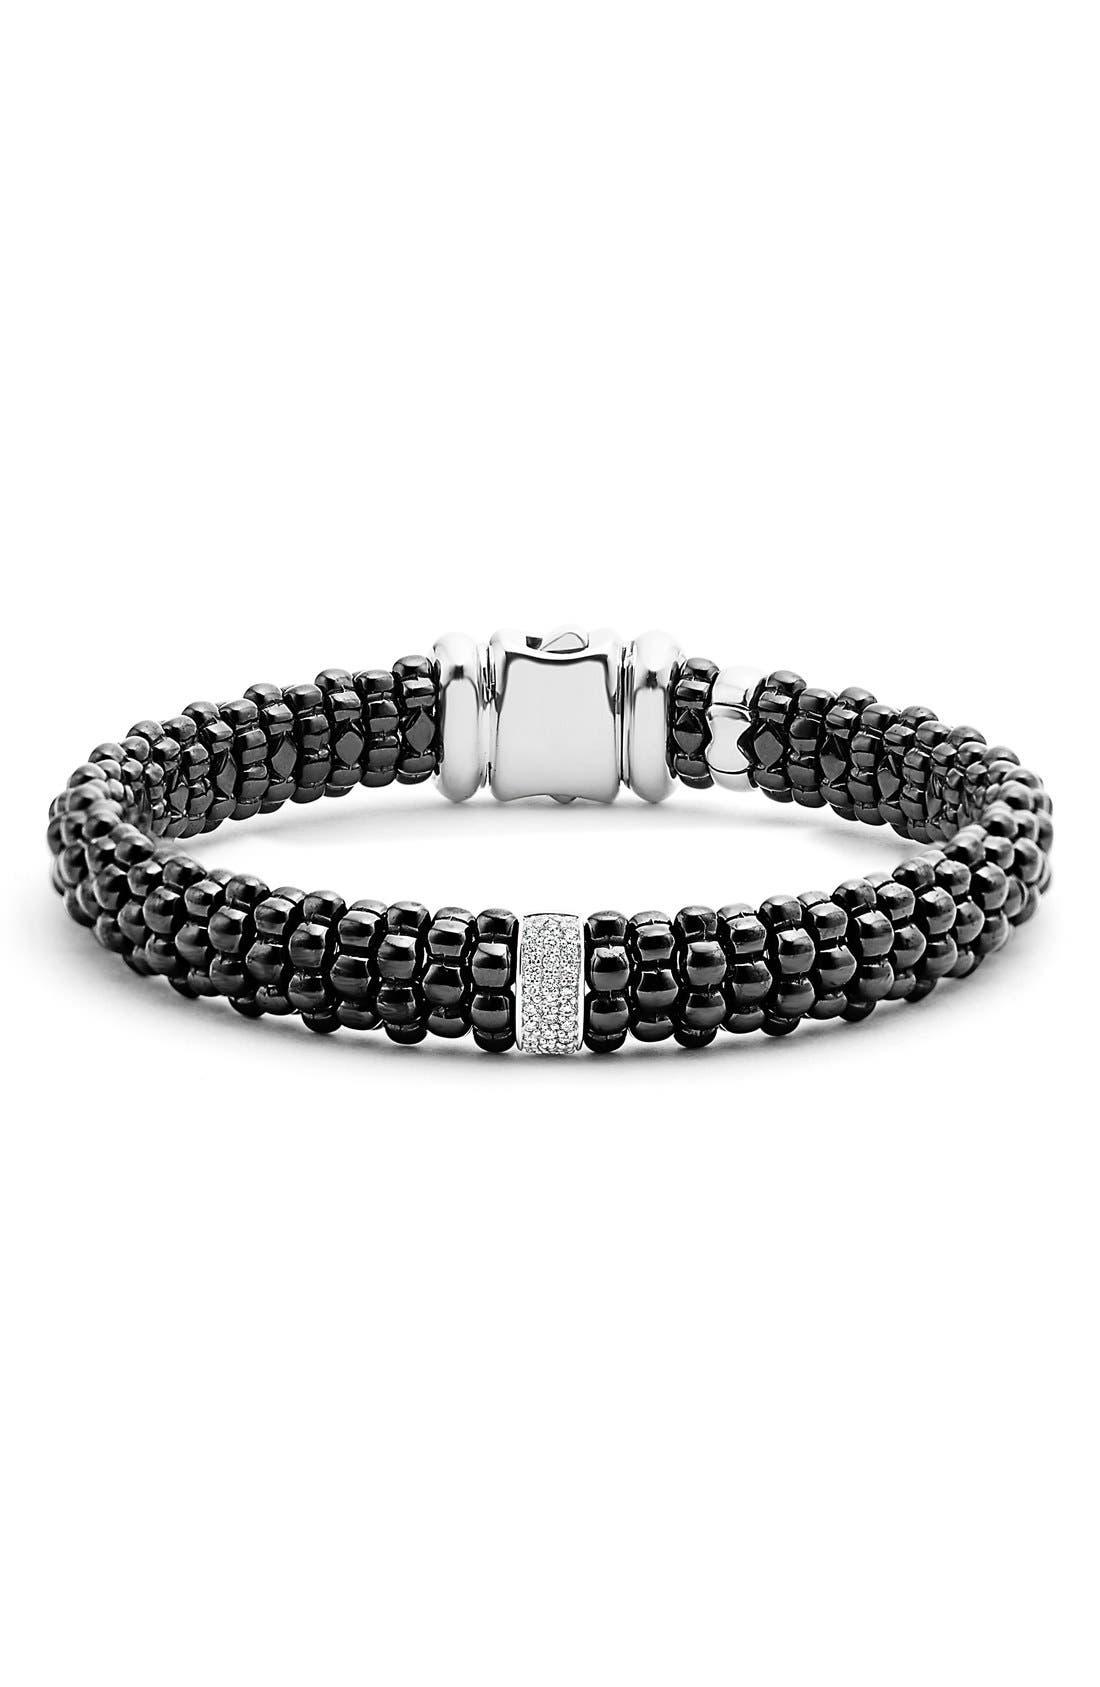 Black Caviar Bracelet,                             Main thumbnail 1, color,                             Black/ Silver